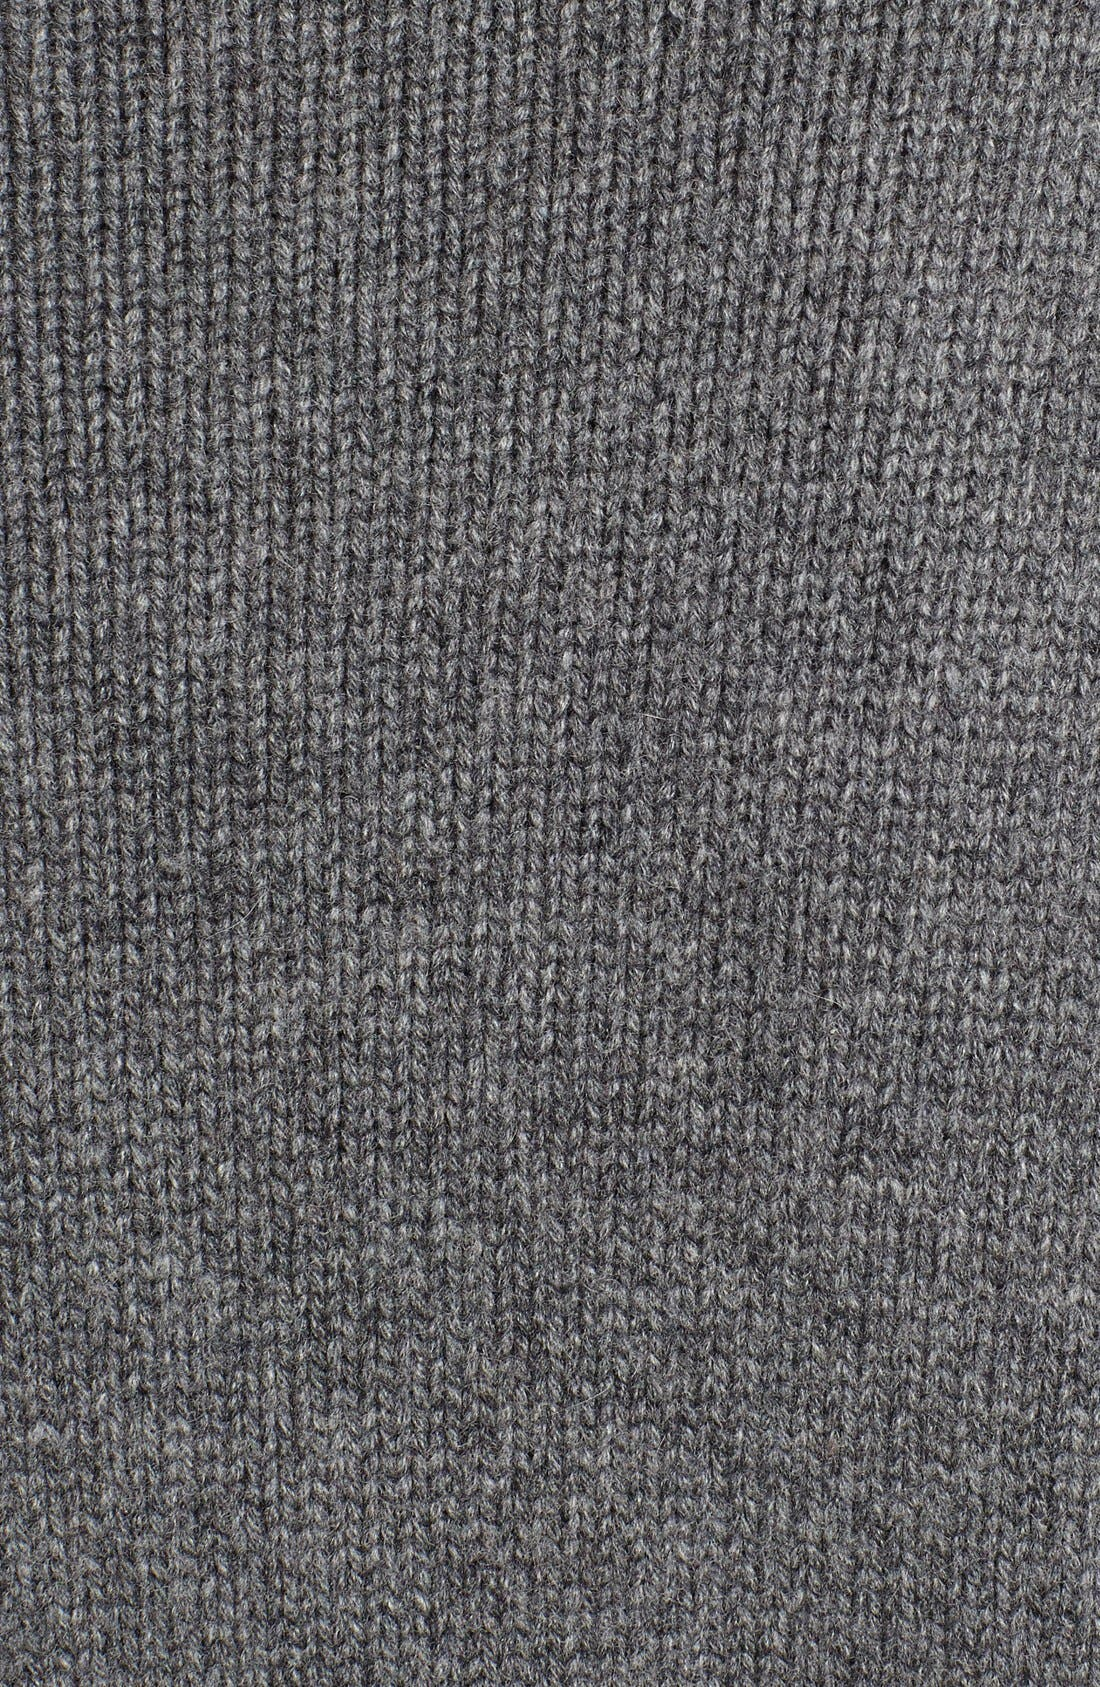 Studded Crewneck Cashmere Sweater,                             Alternate thumbnail 5, color,                             GREY